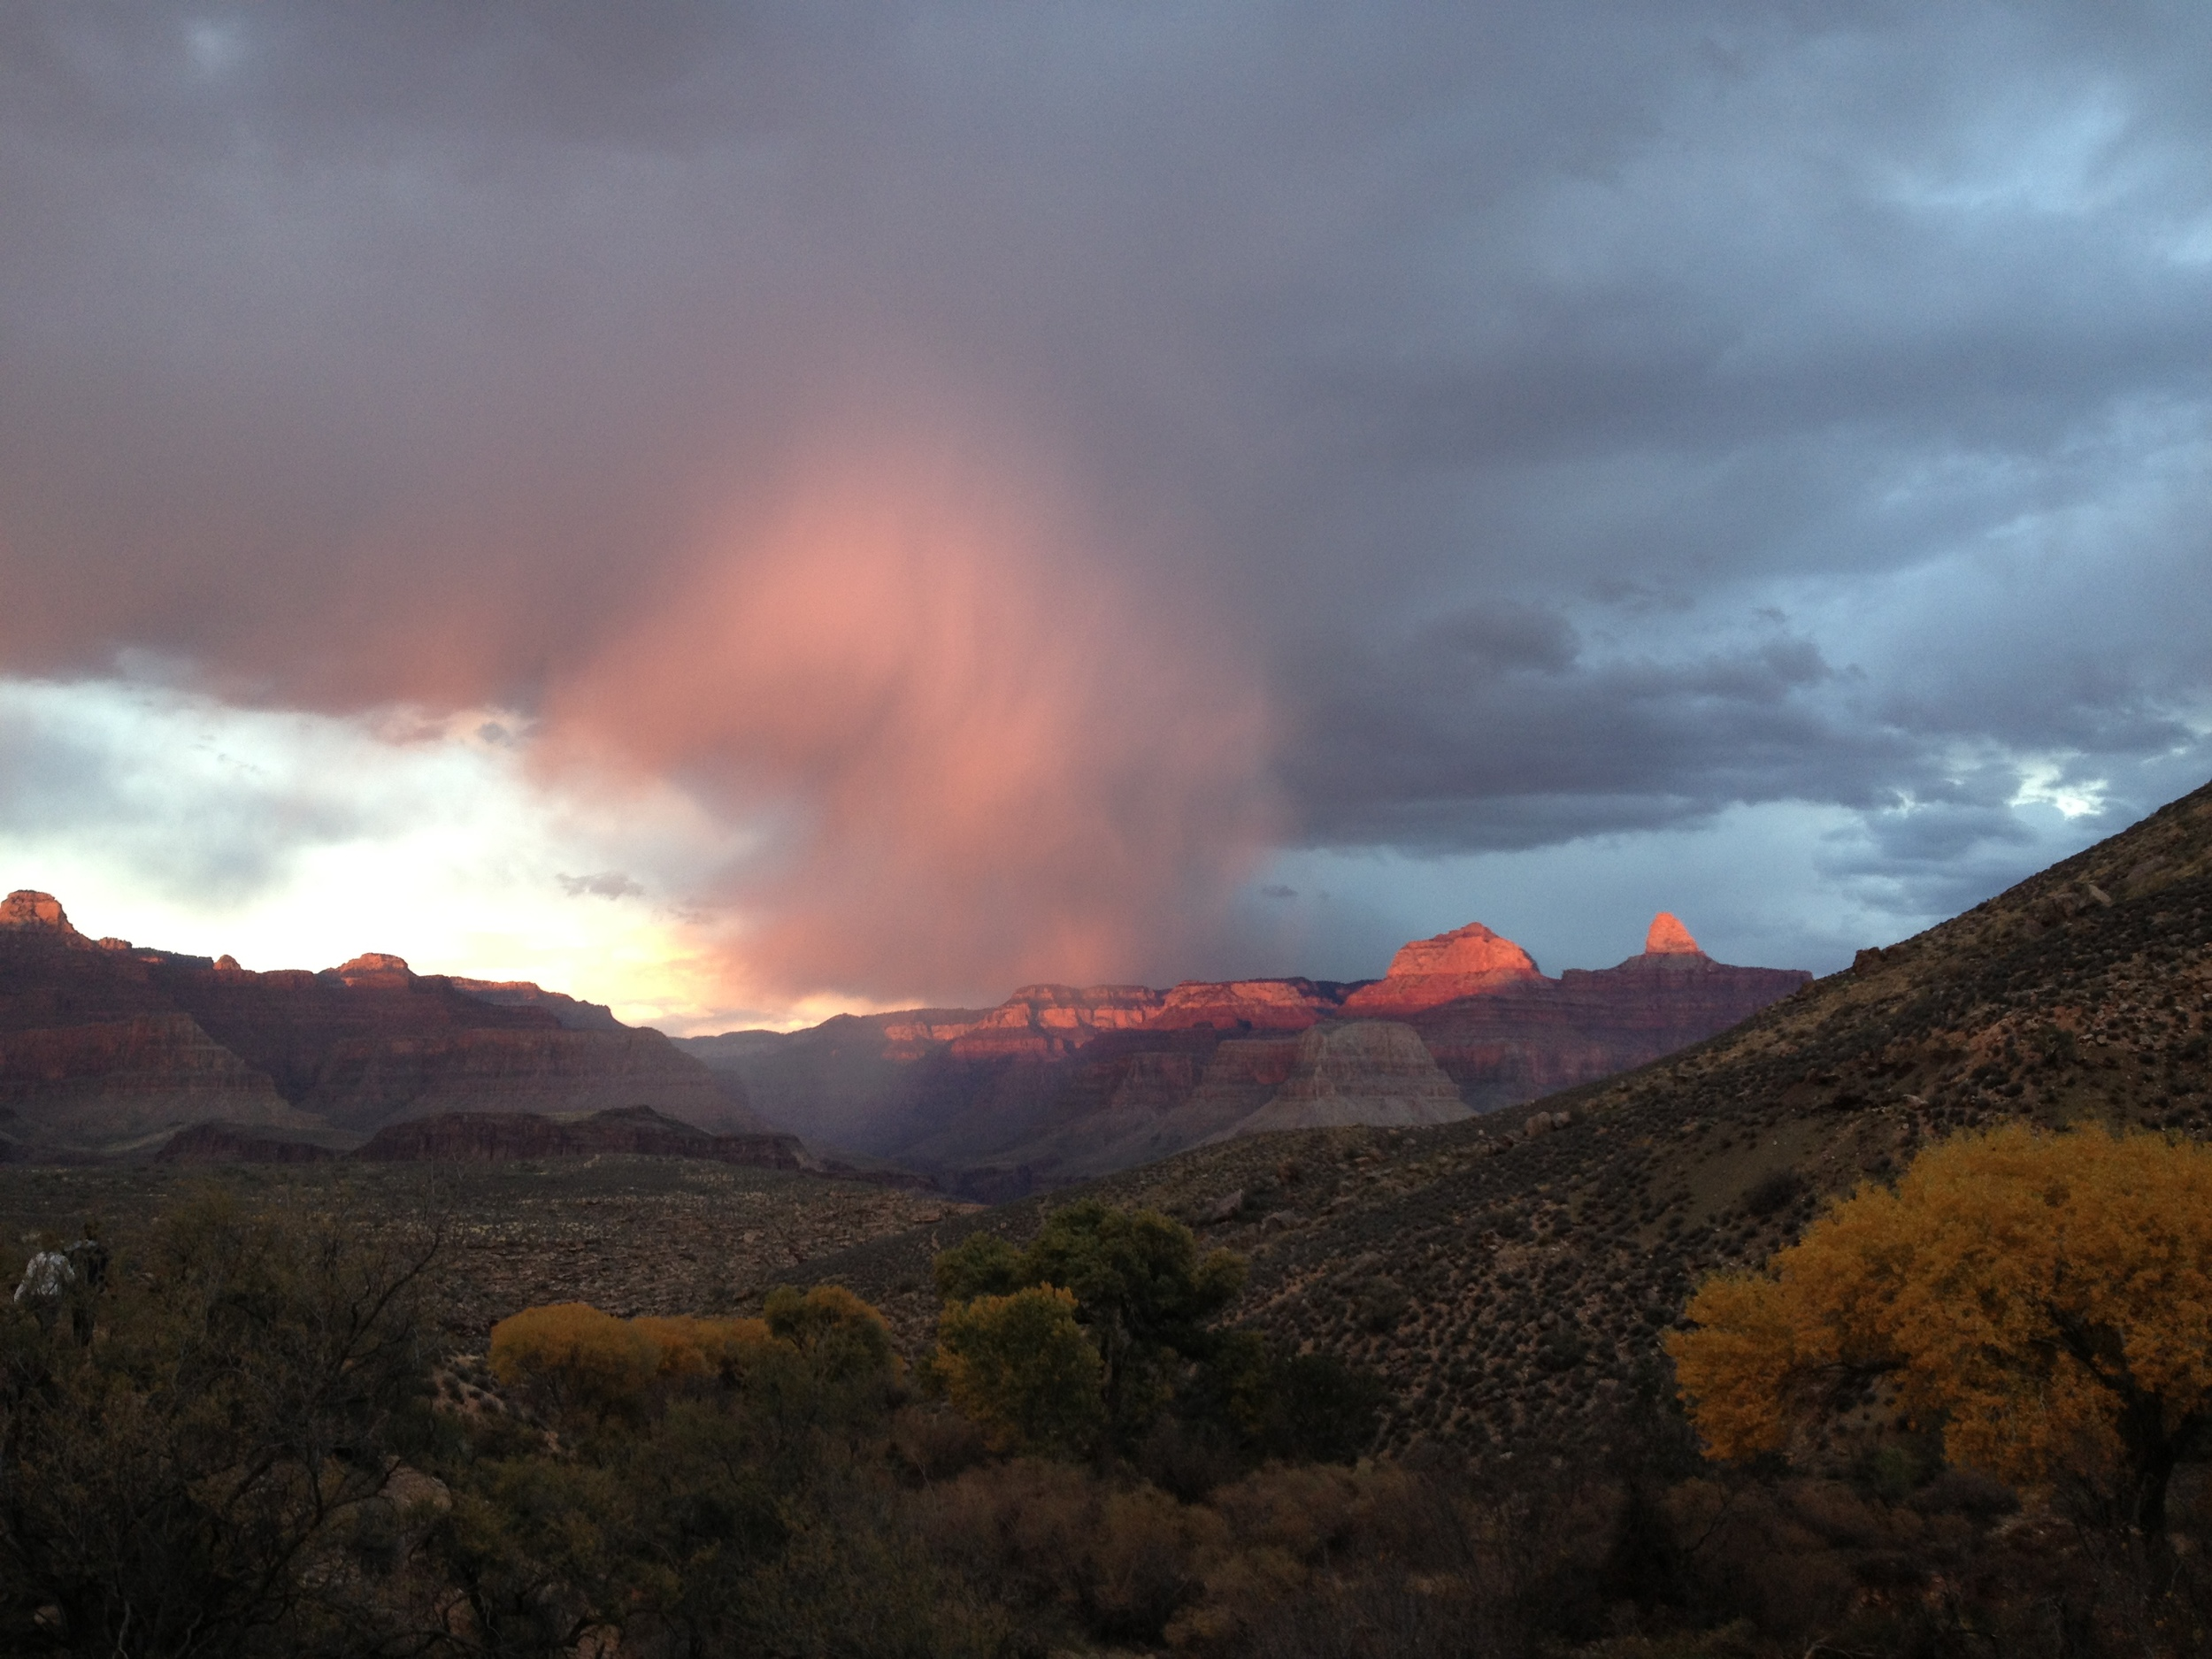 Sunset at Grand Canyon near Indian Garden